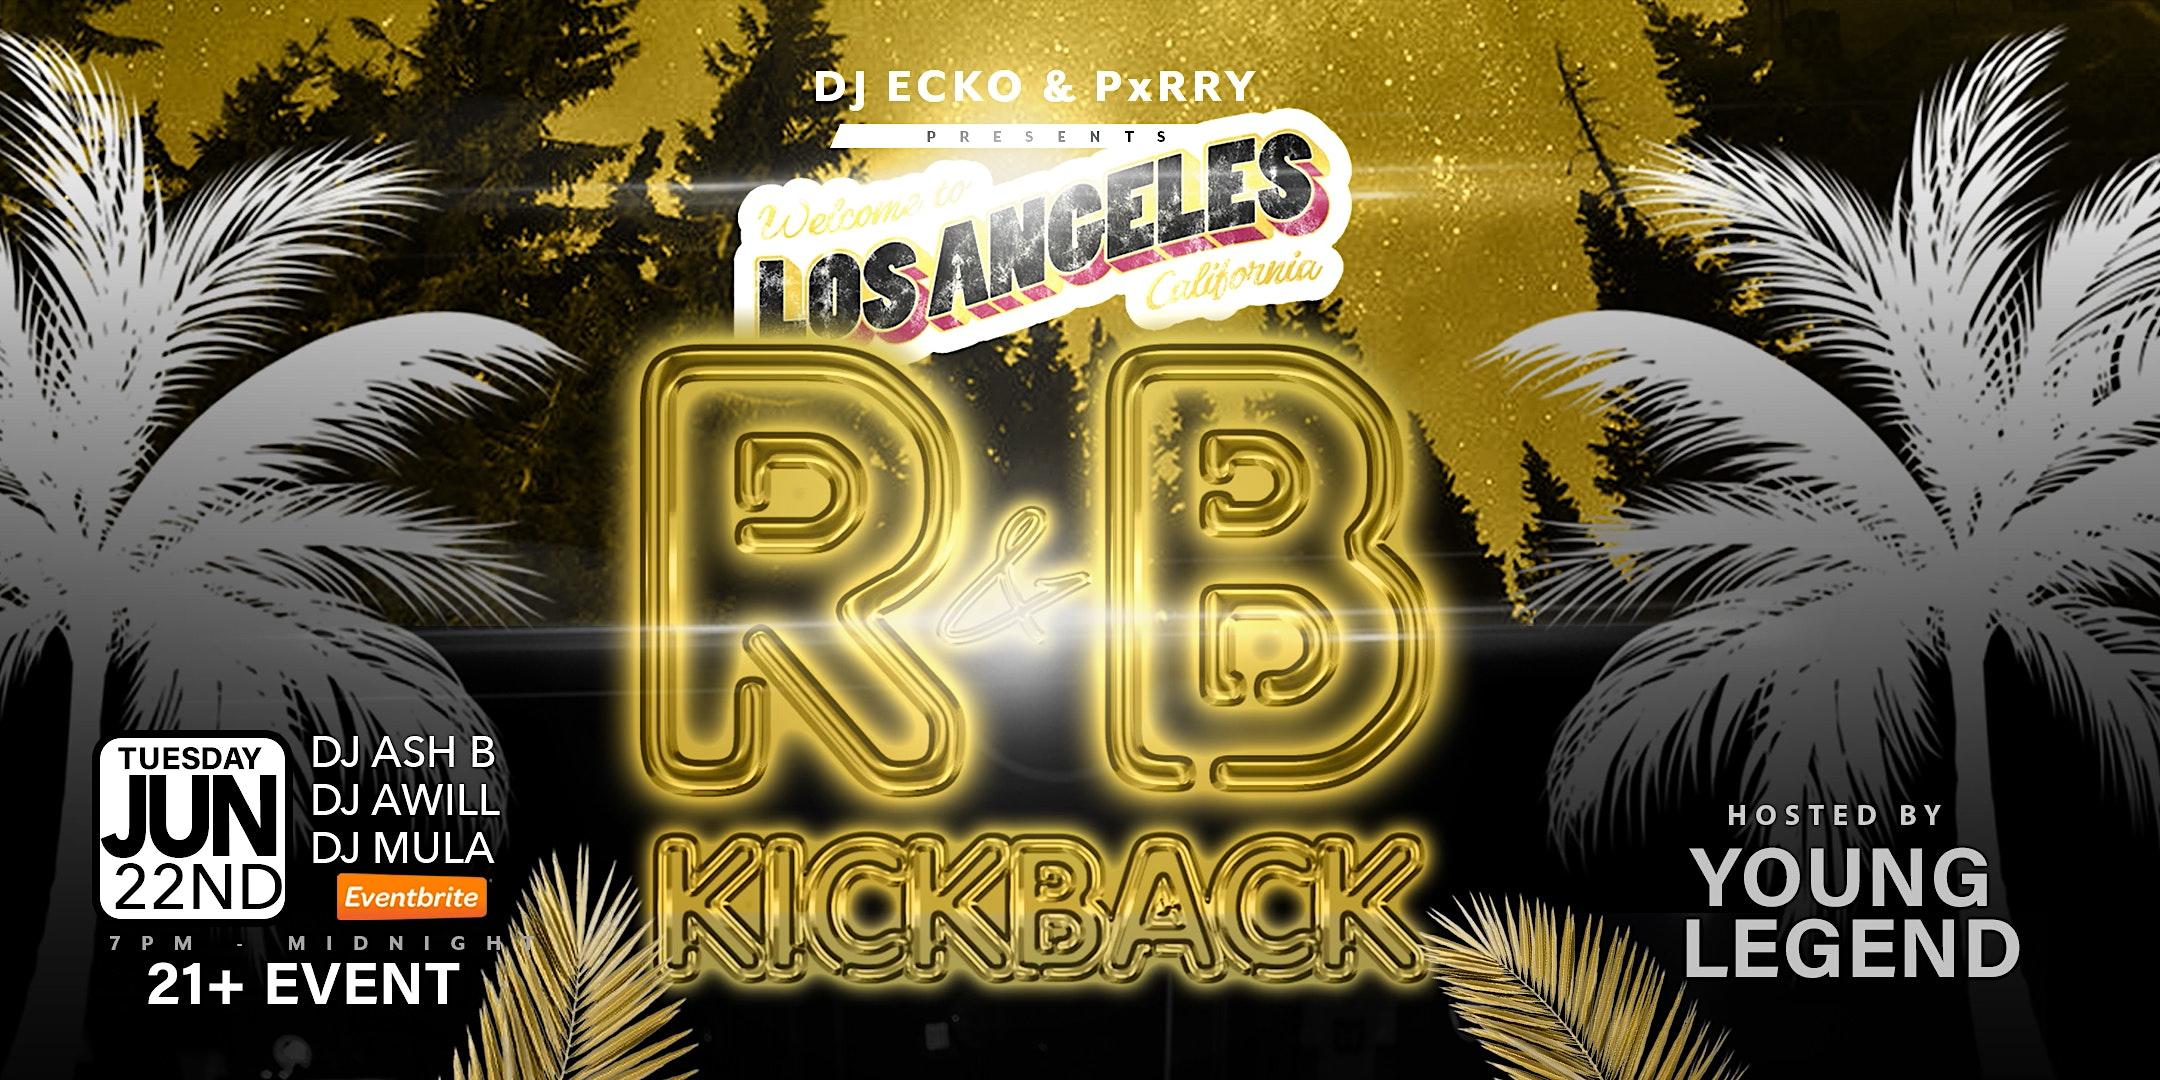 R&B KICKBACK PARTY